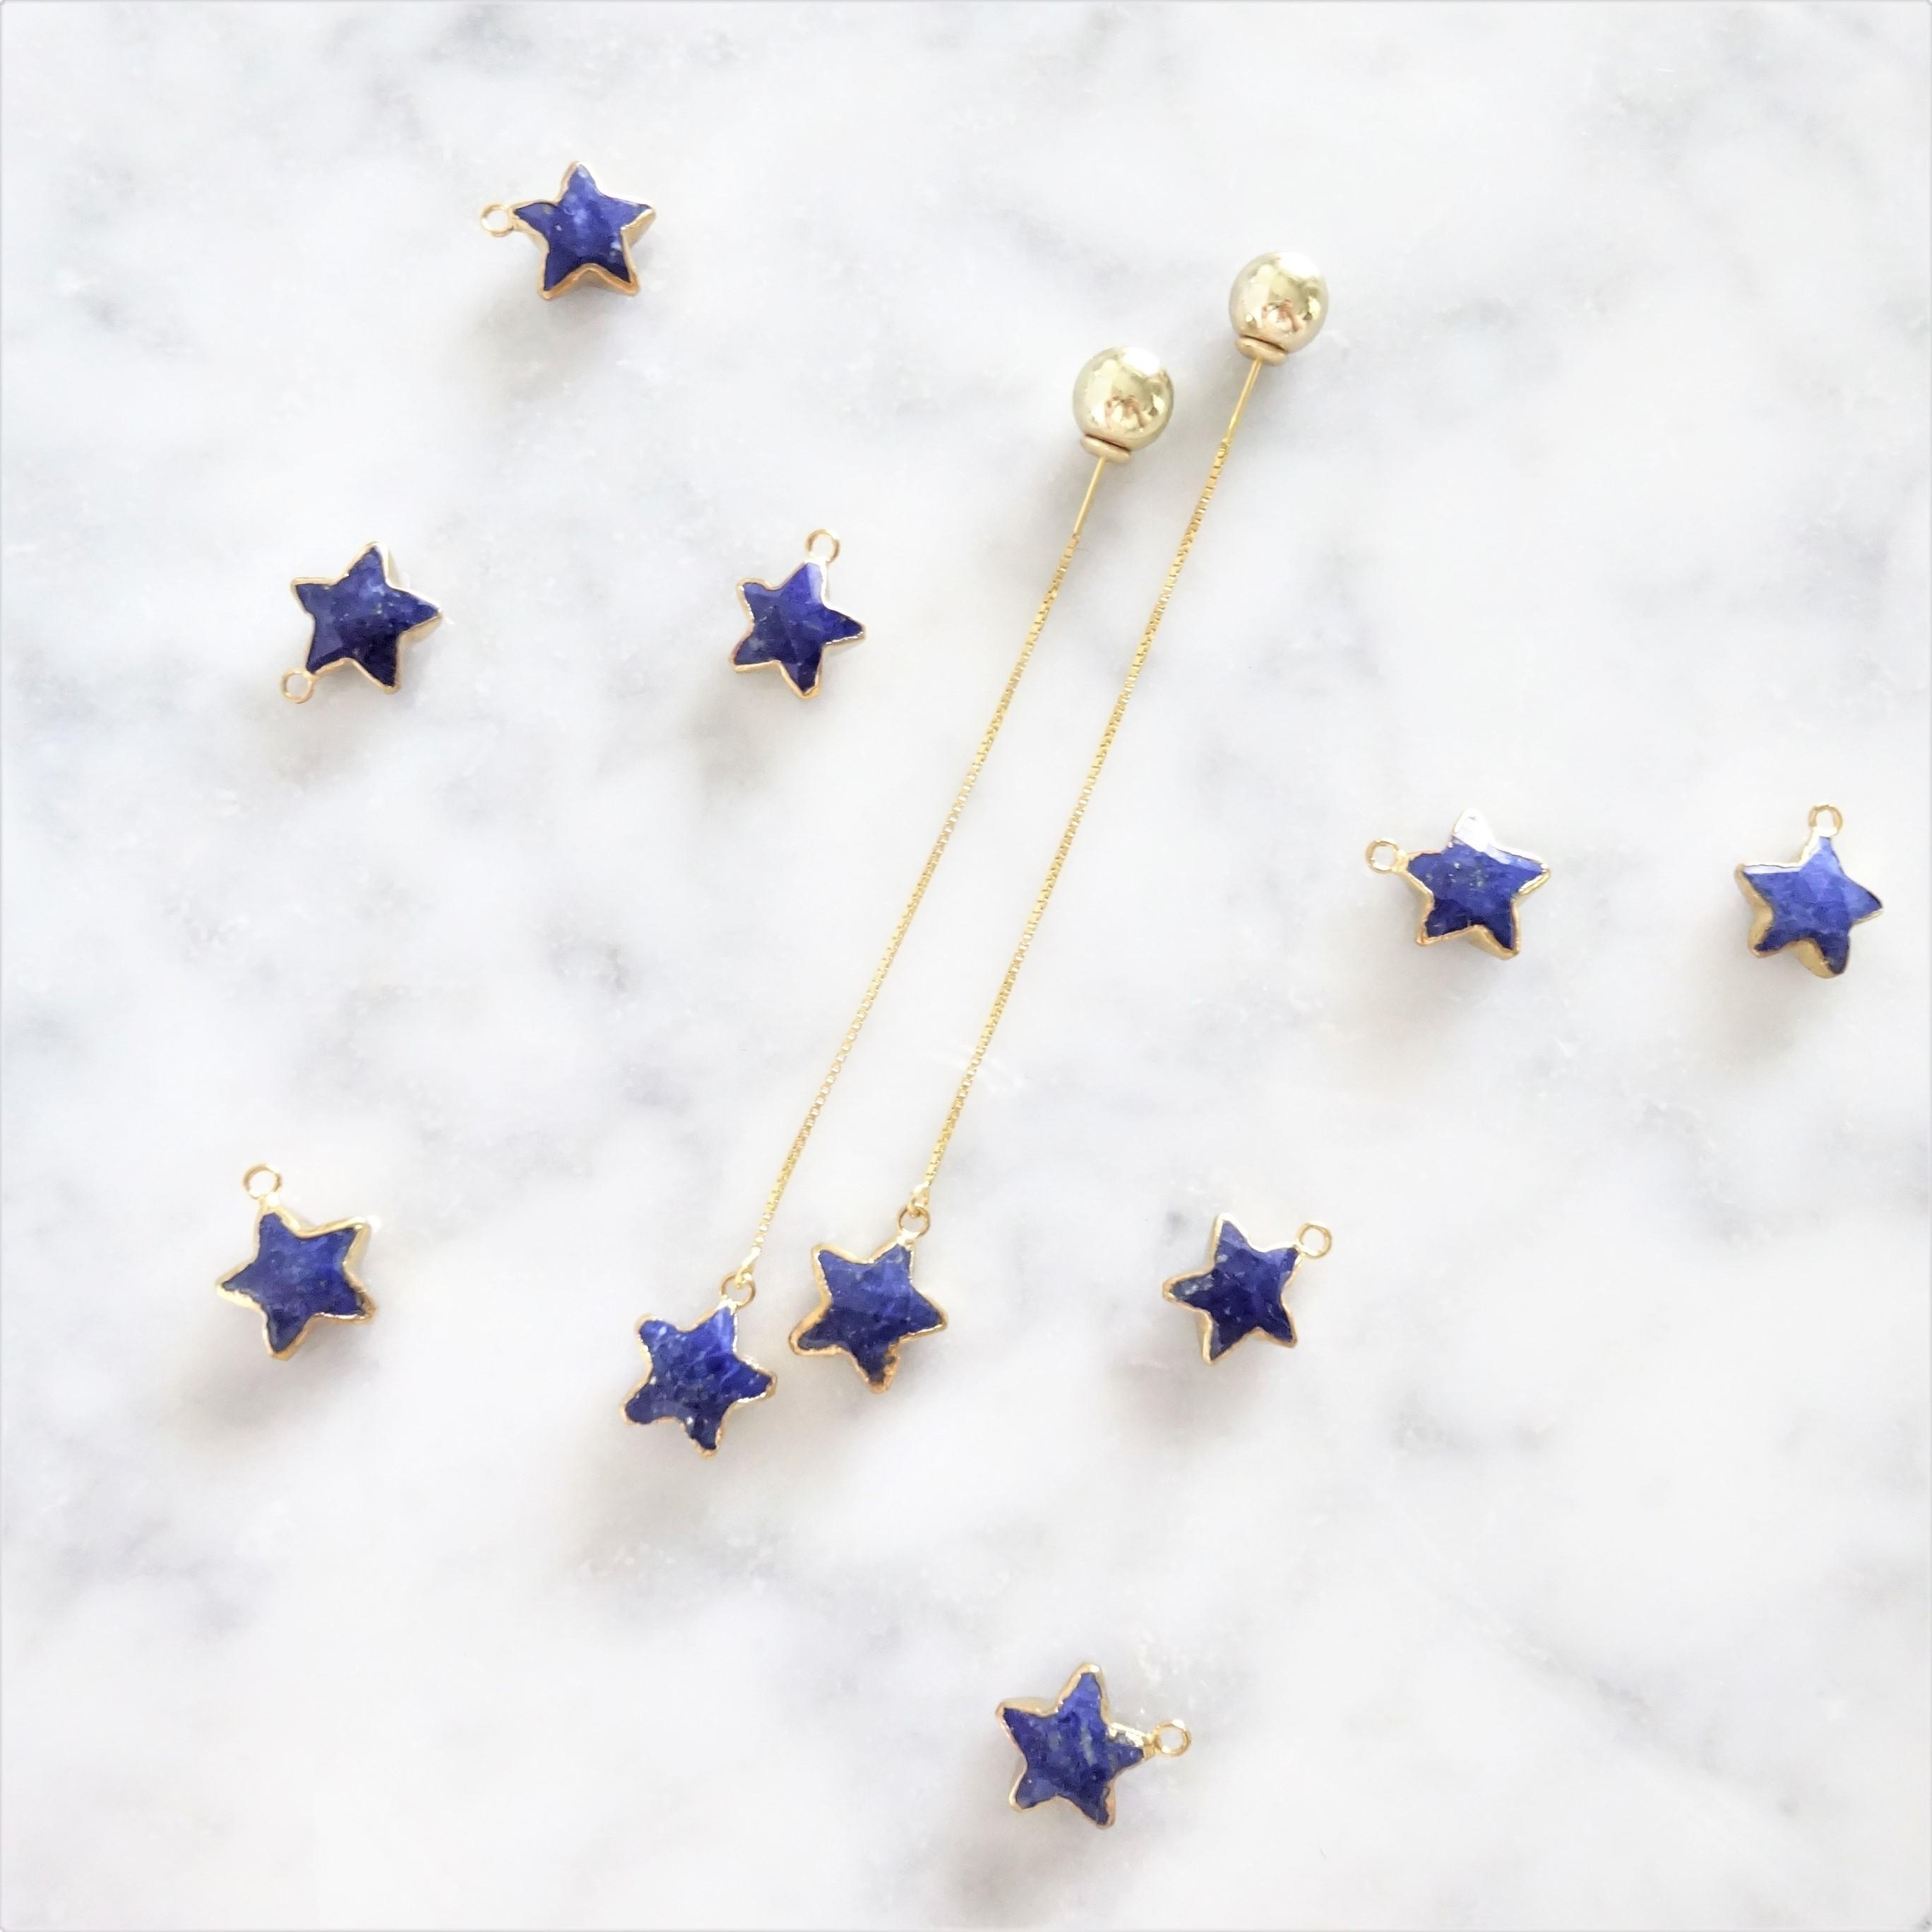 送料無料14kgf*Lapis lazuli STAR american pierced earring